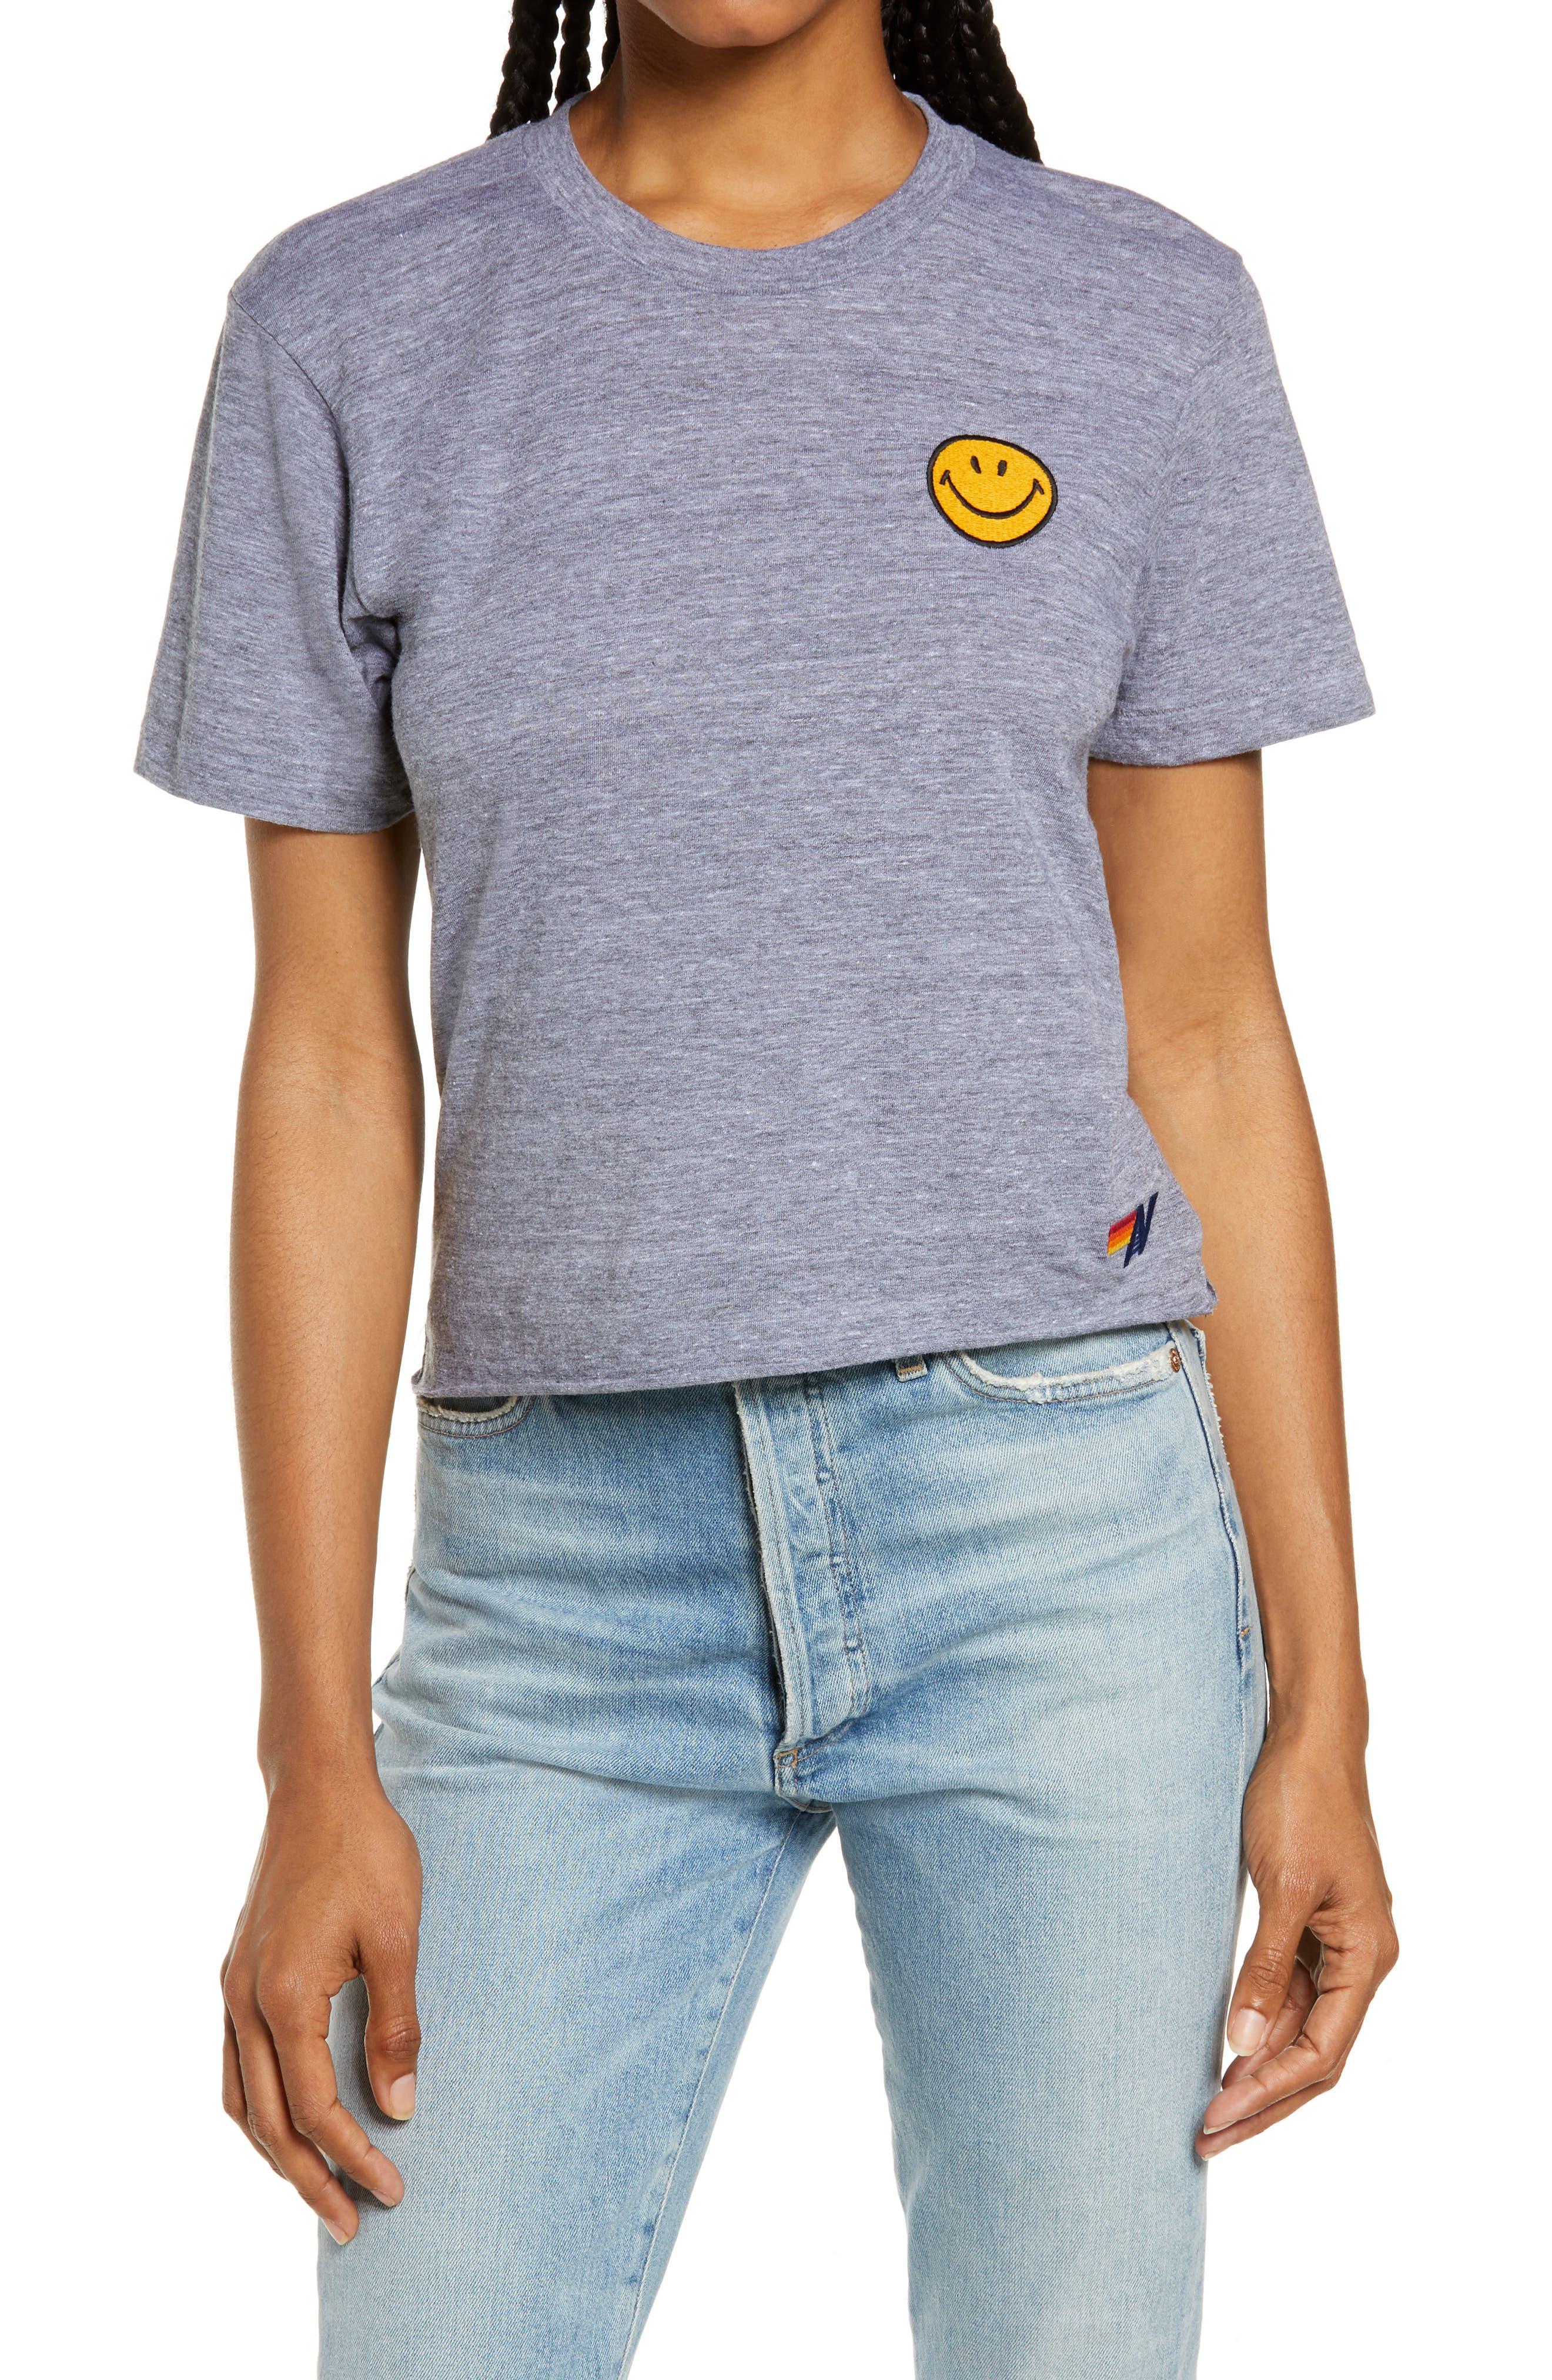 Smile Embroidered Boyfriend T-Shirt